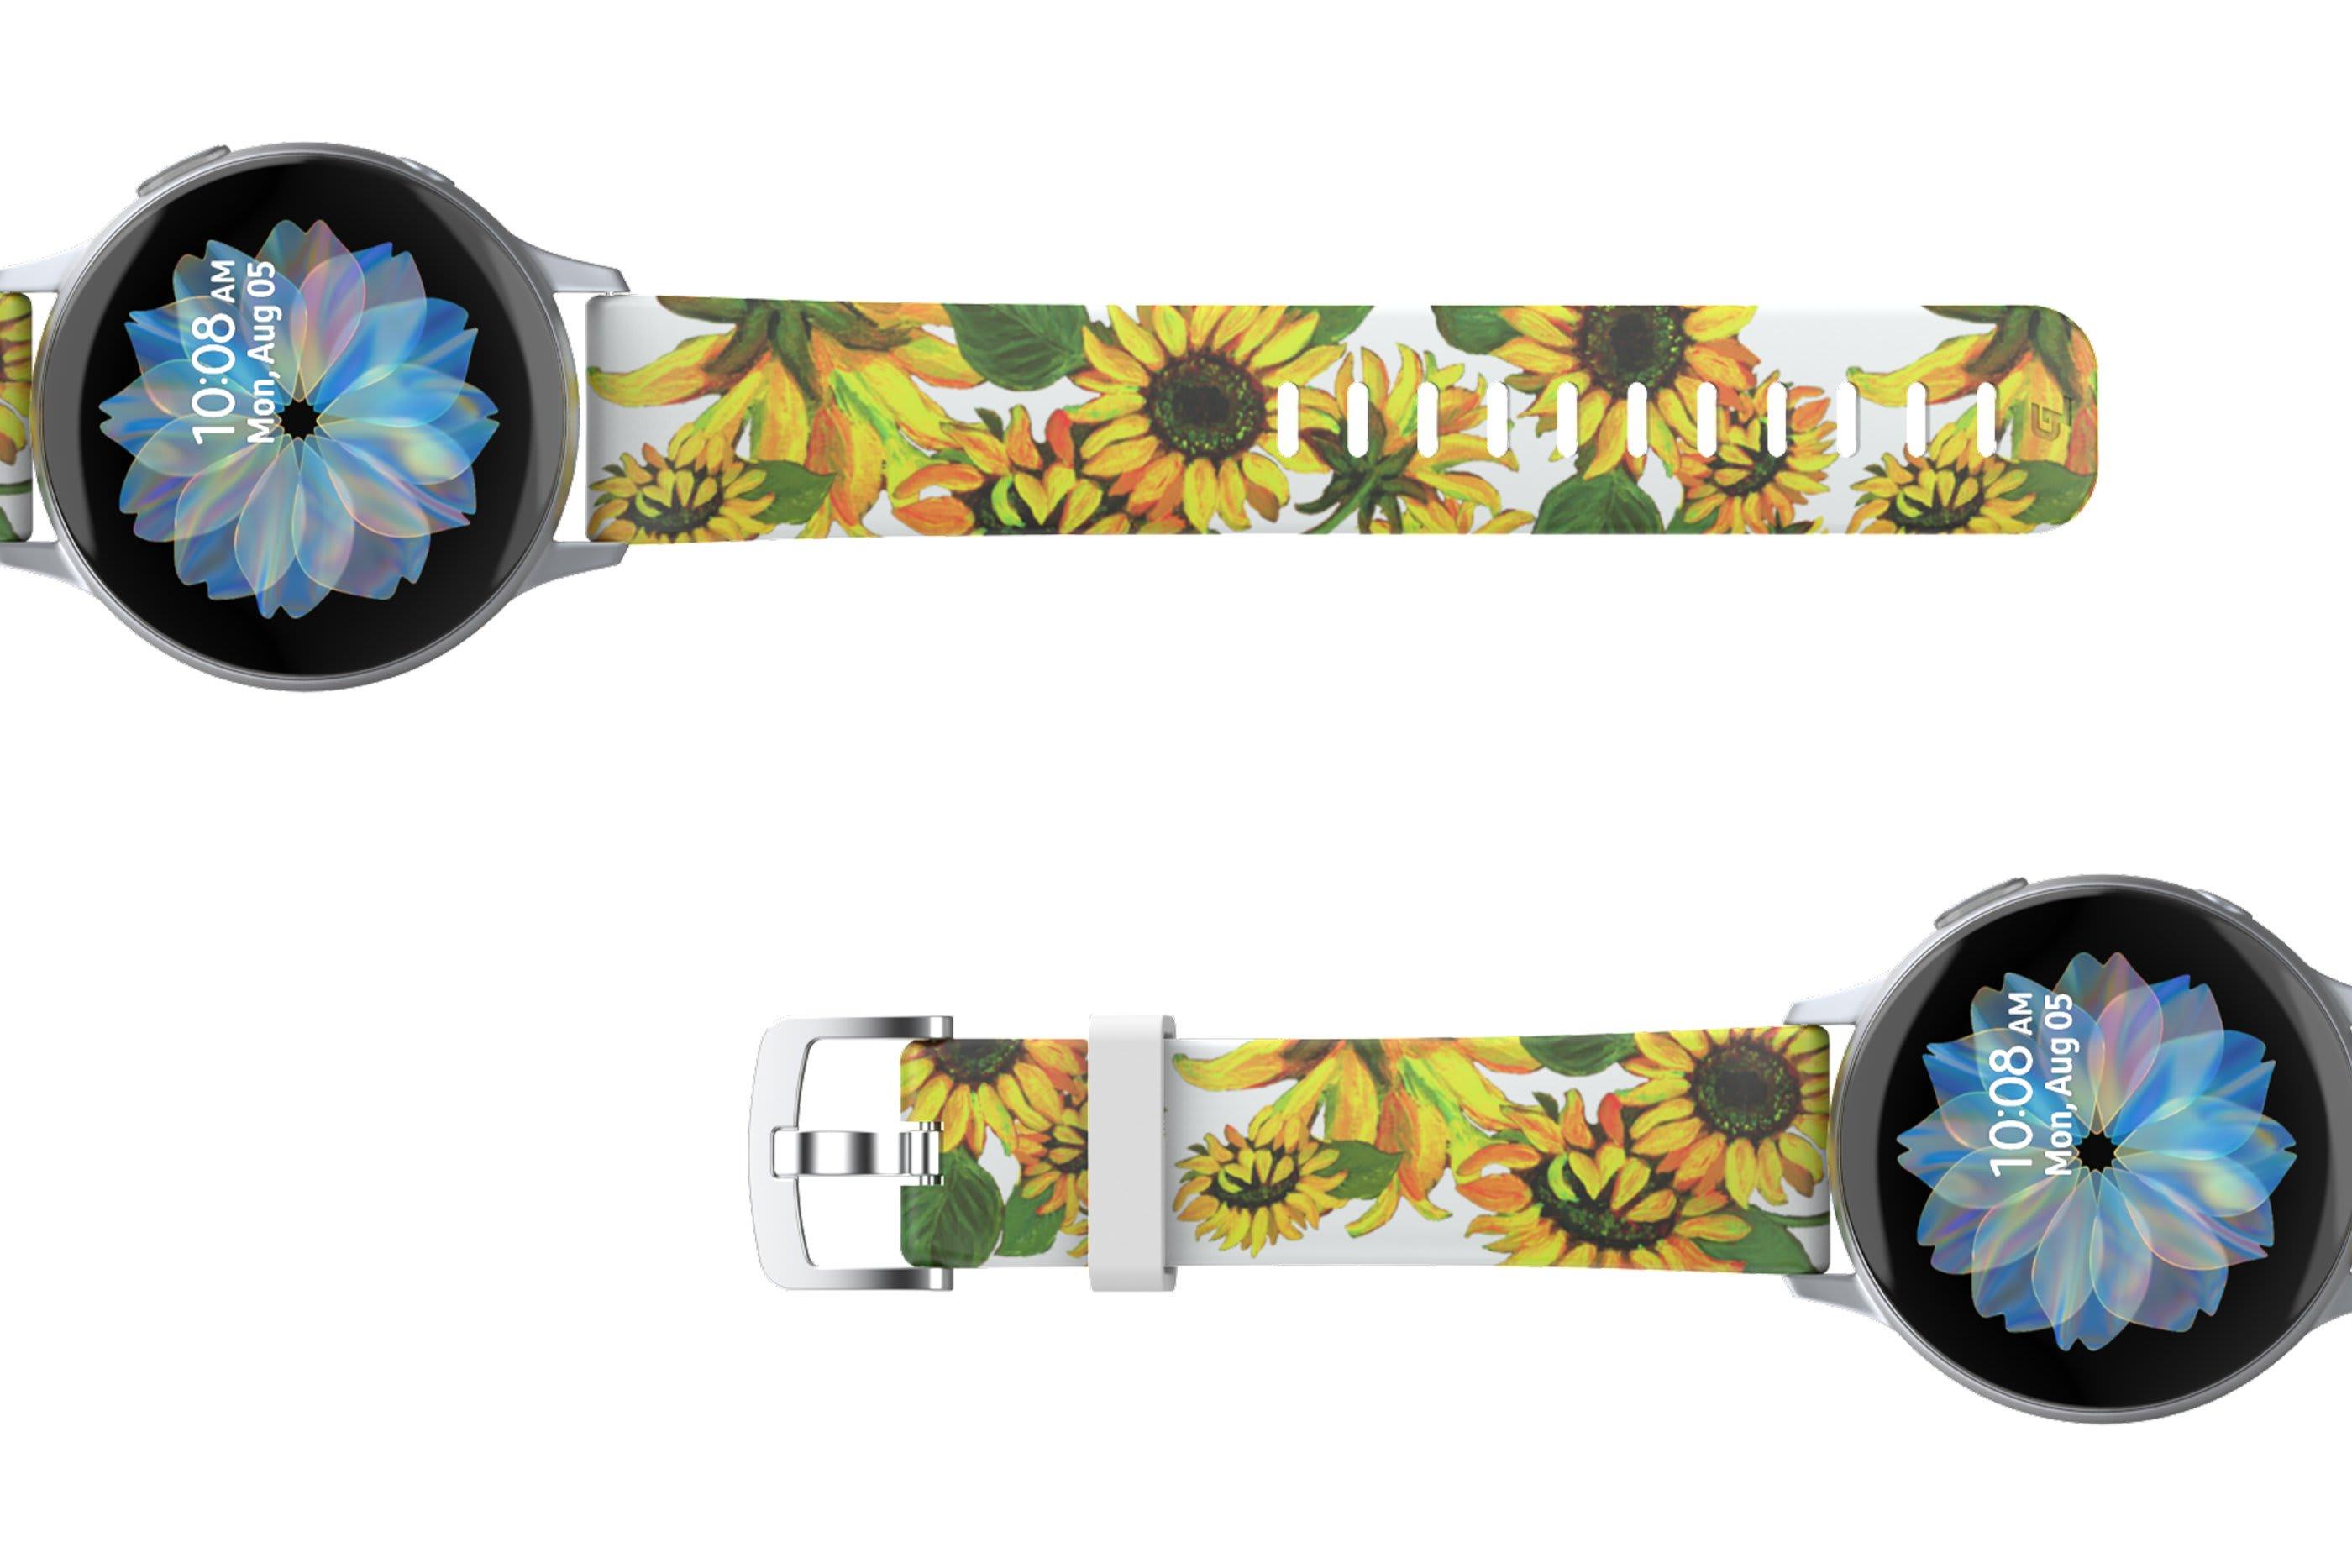 Sunflower Samsung 22mm watch band viewed top down